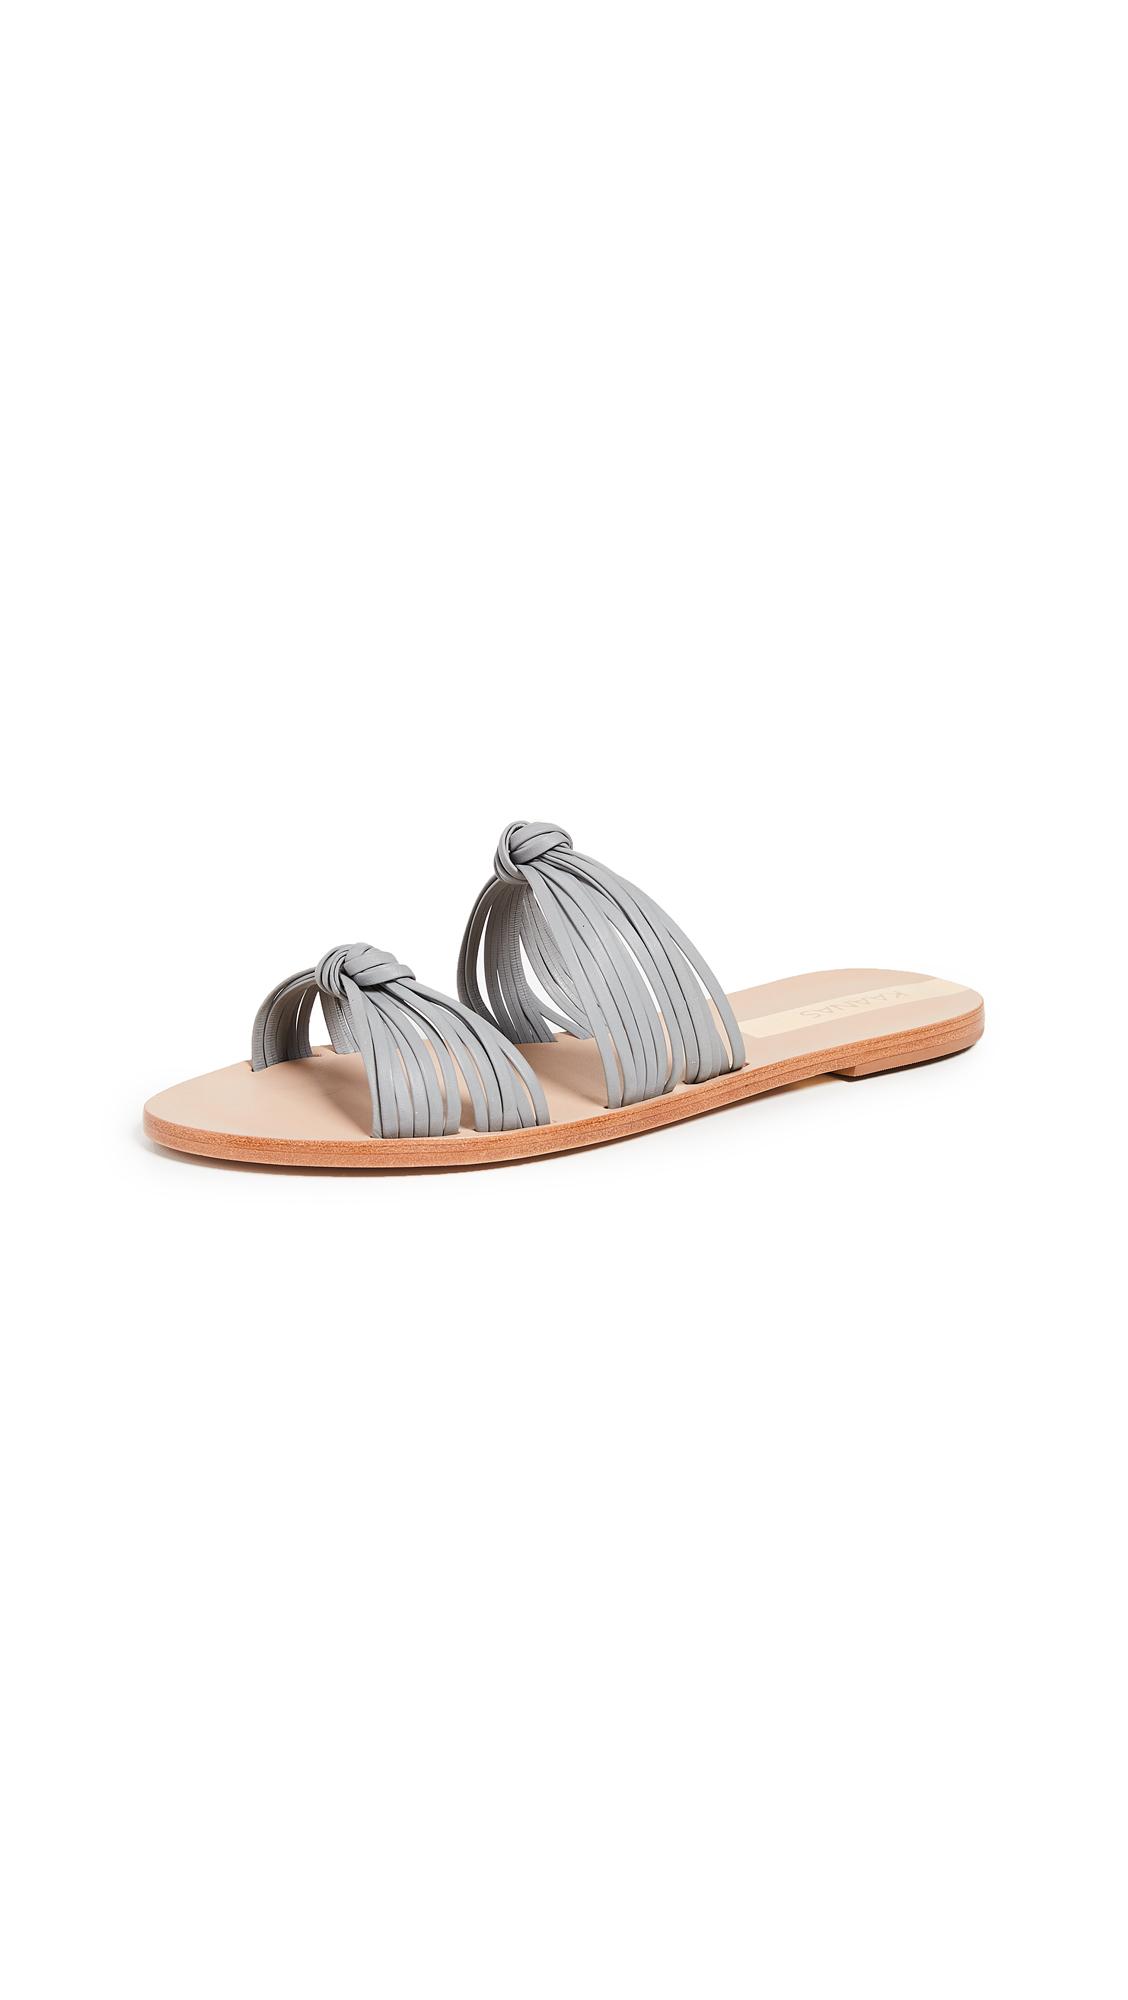 KAANAS Iguazu Multi Strap Sandals - Taupe